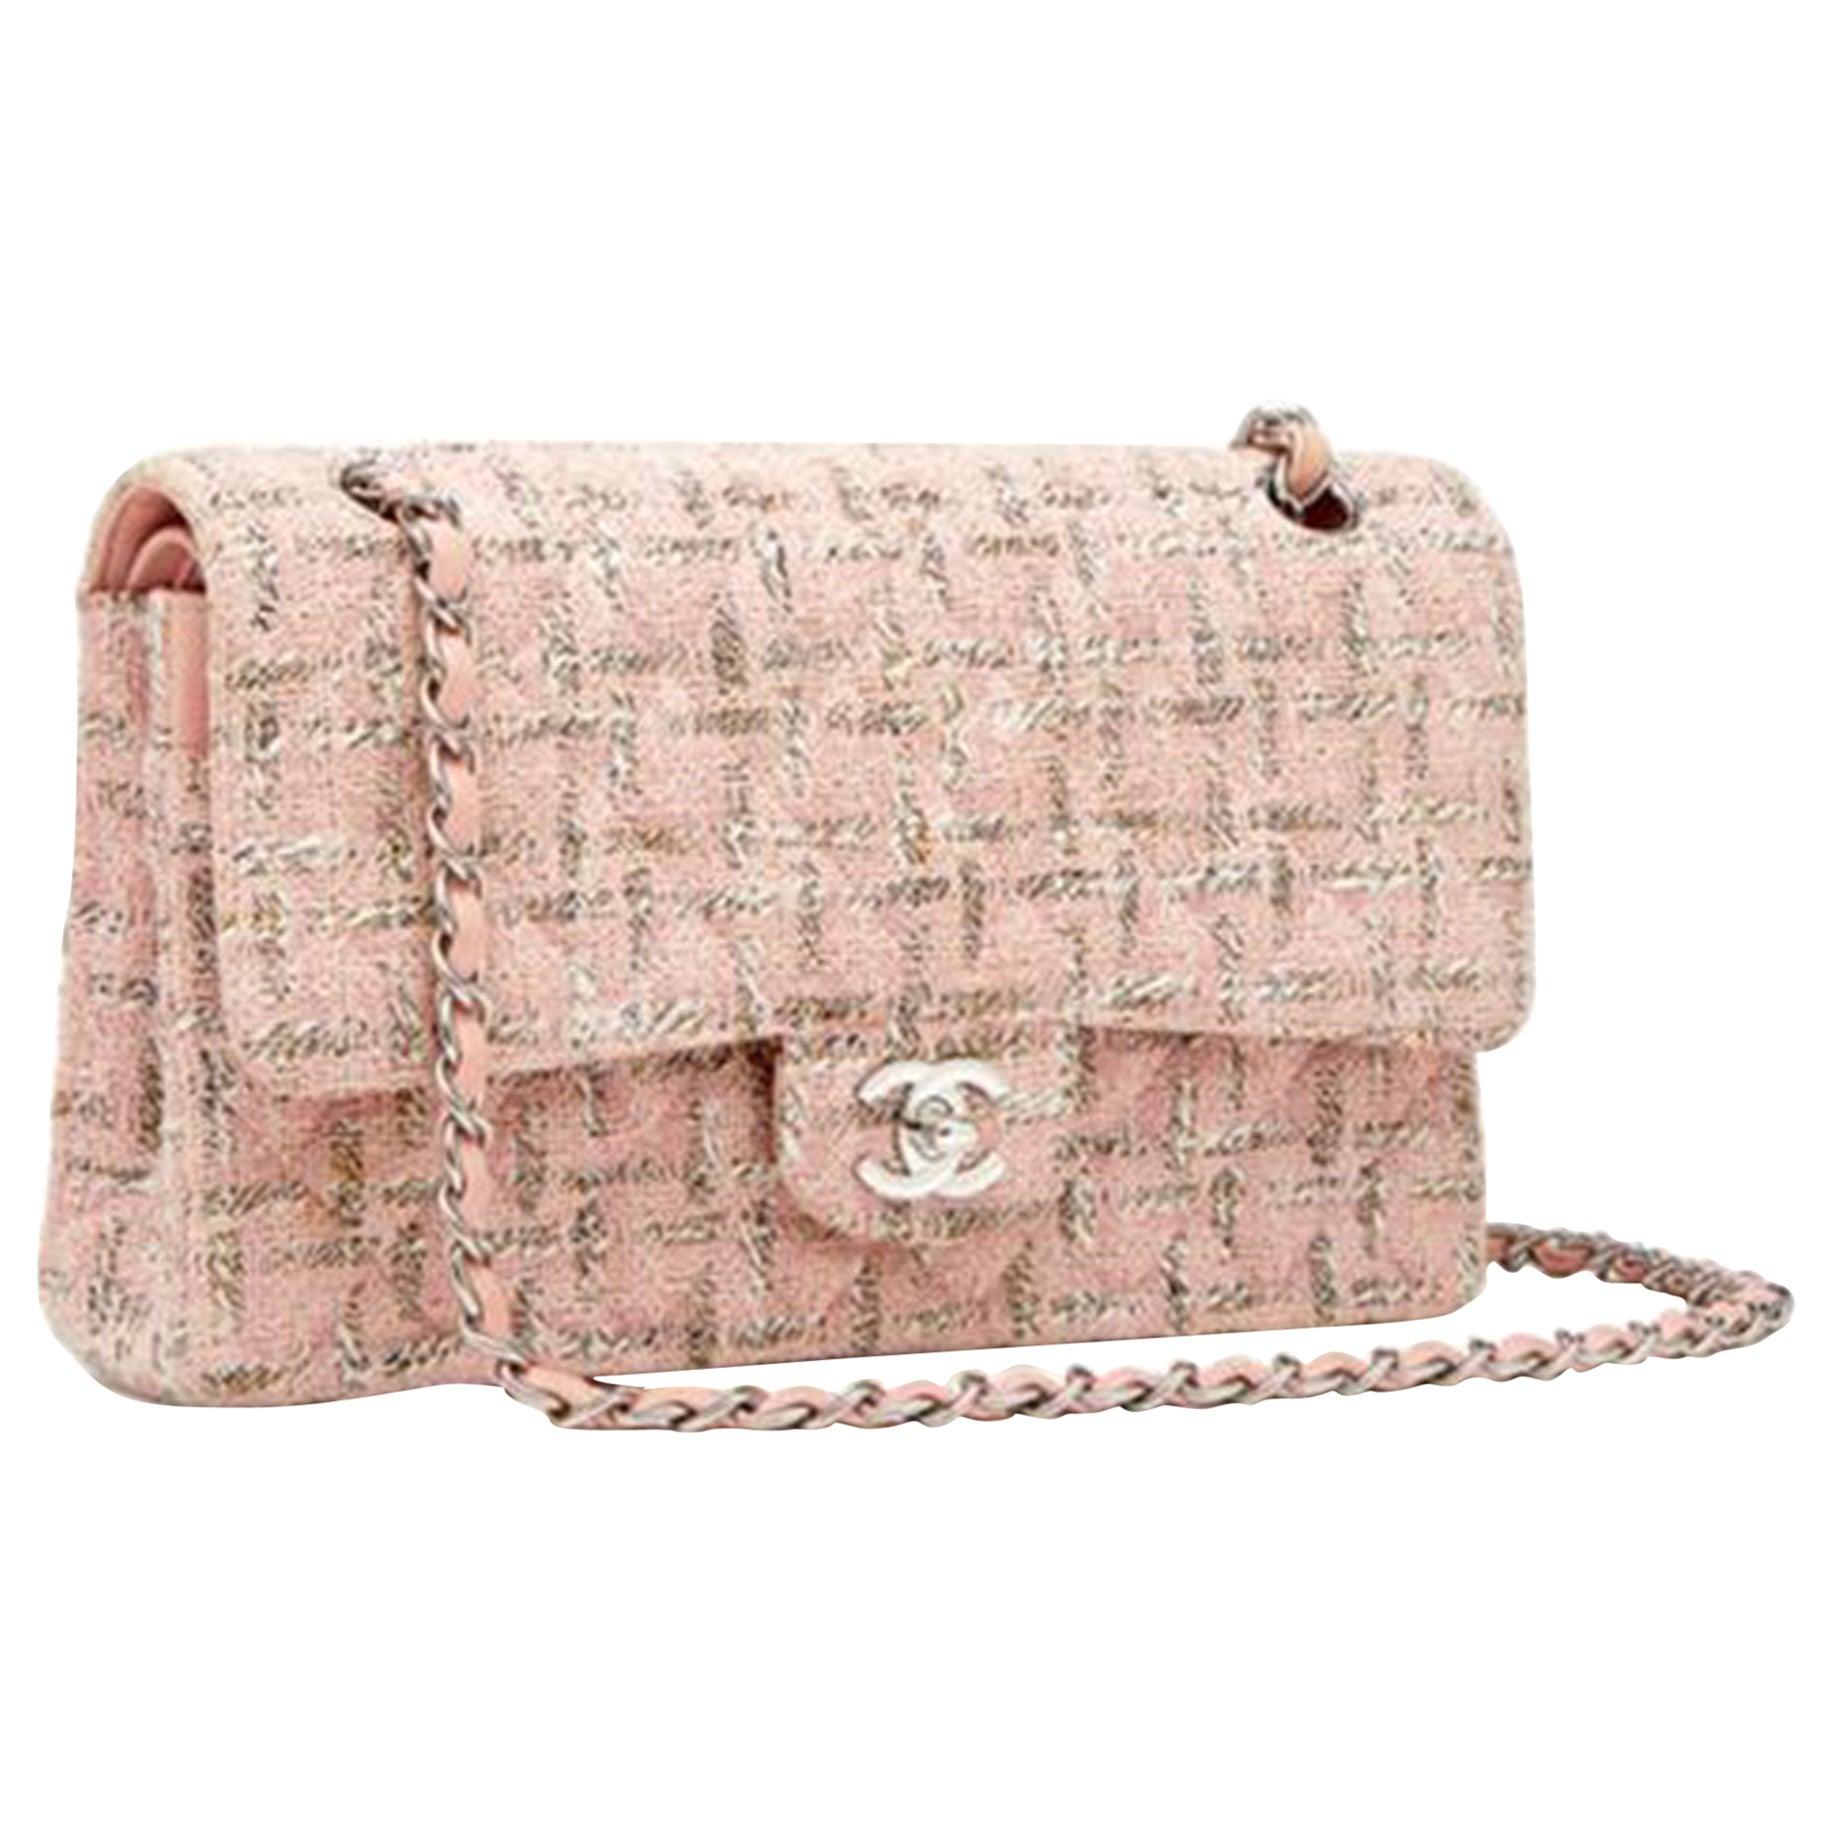 Chanel Classic Flap 2.55 Baby Pink Tweed Shoulder Bag